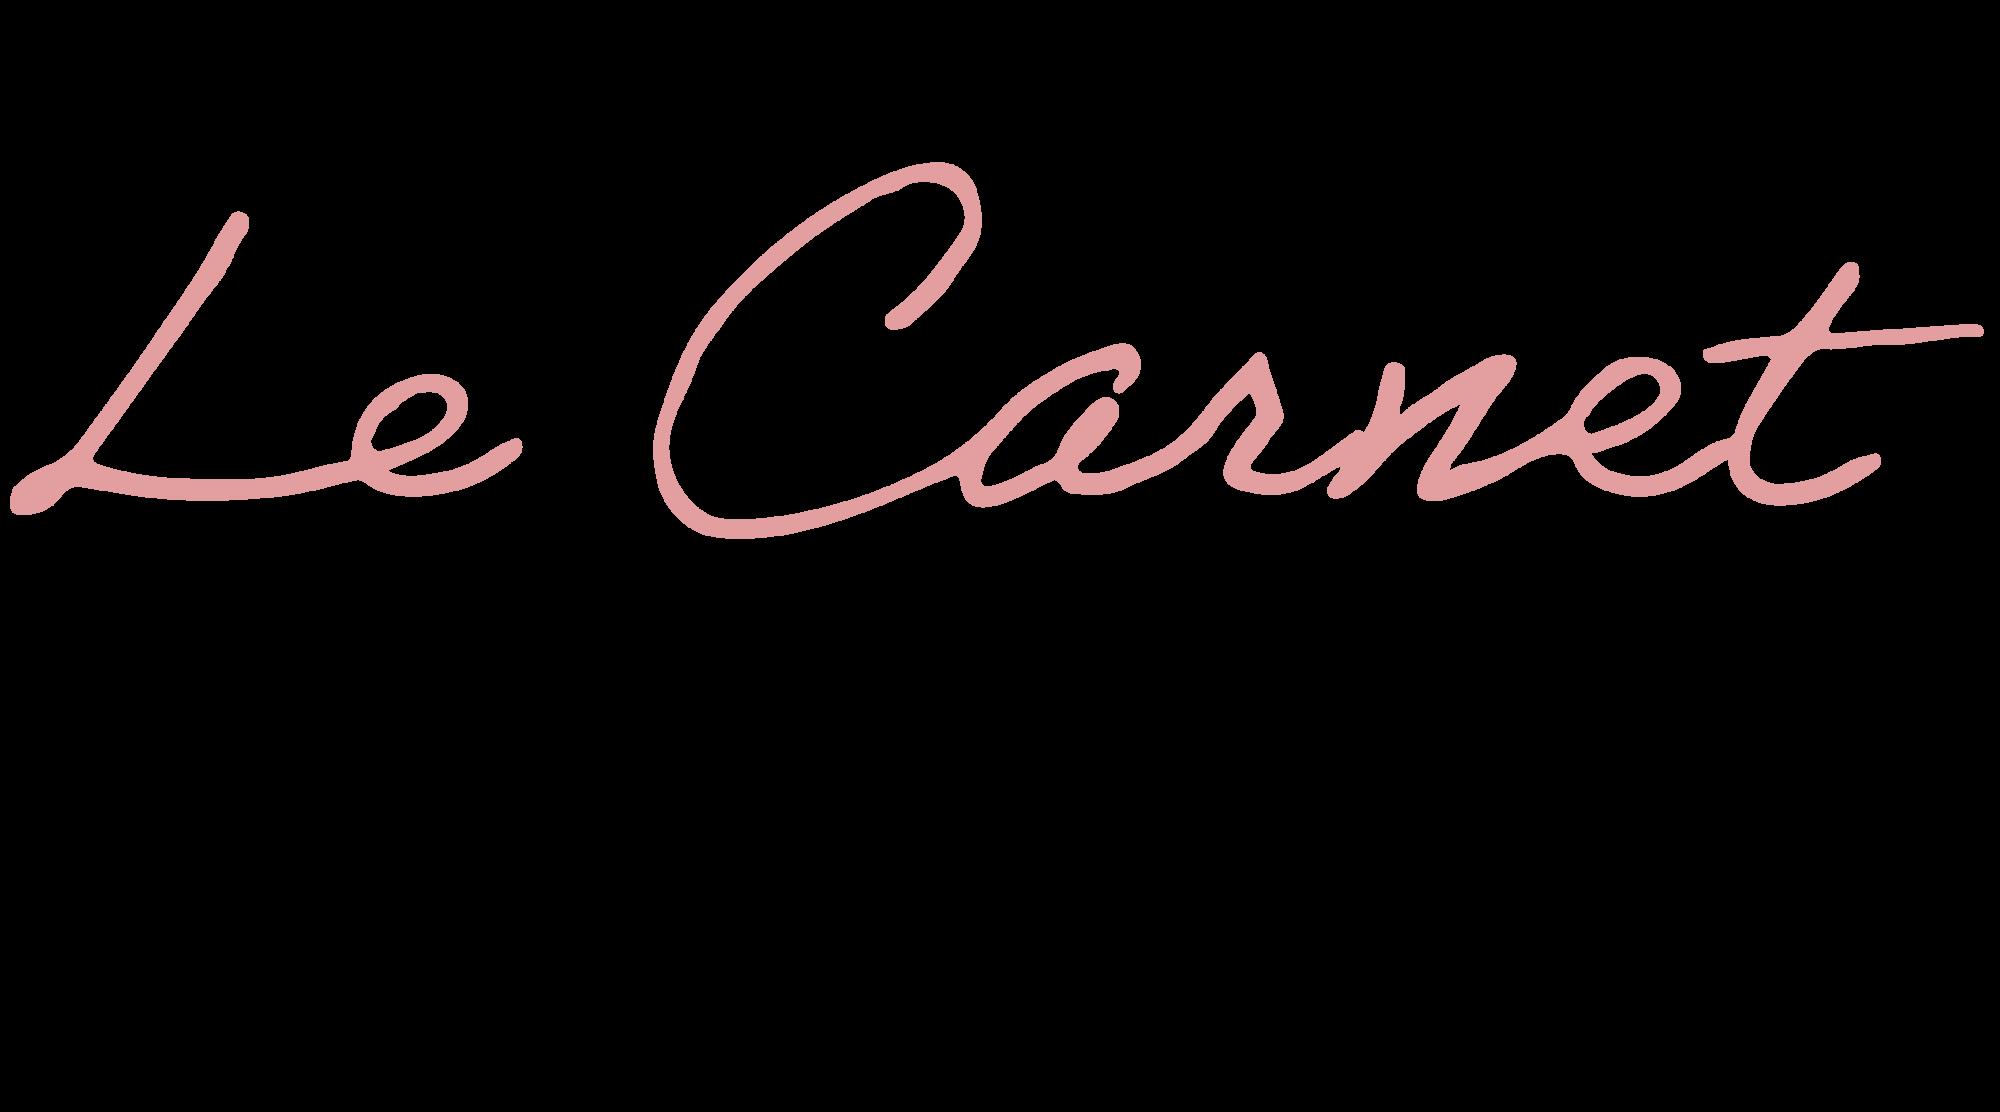 Le Carnet | Gemmyo